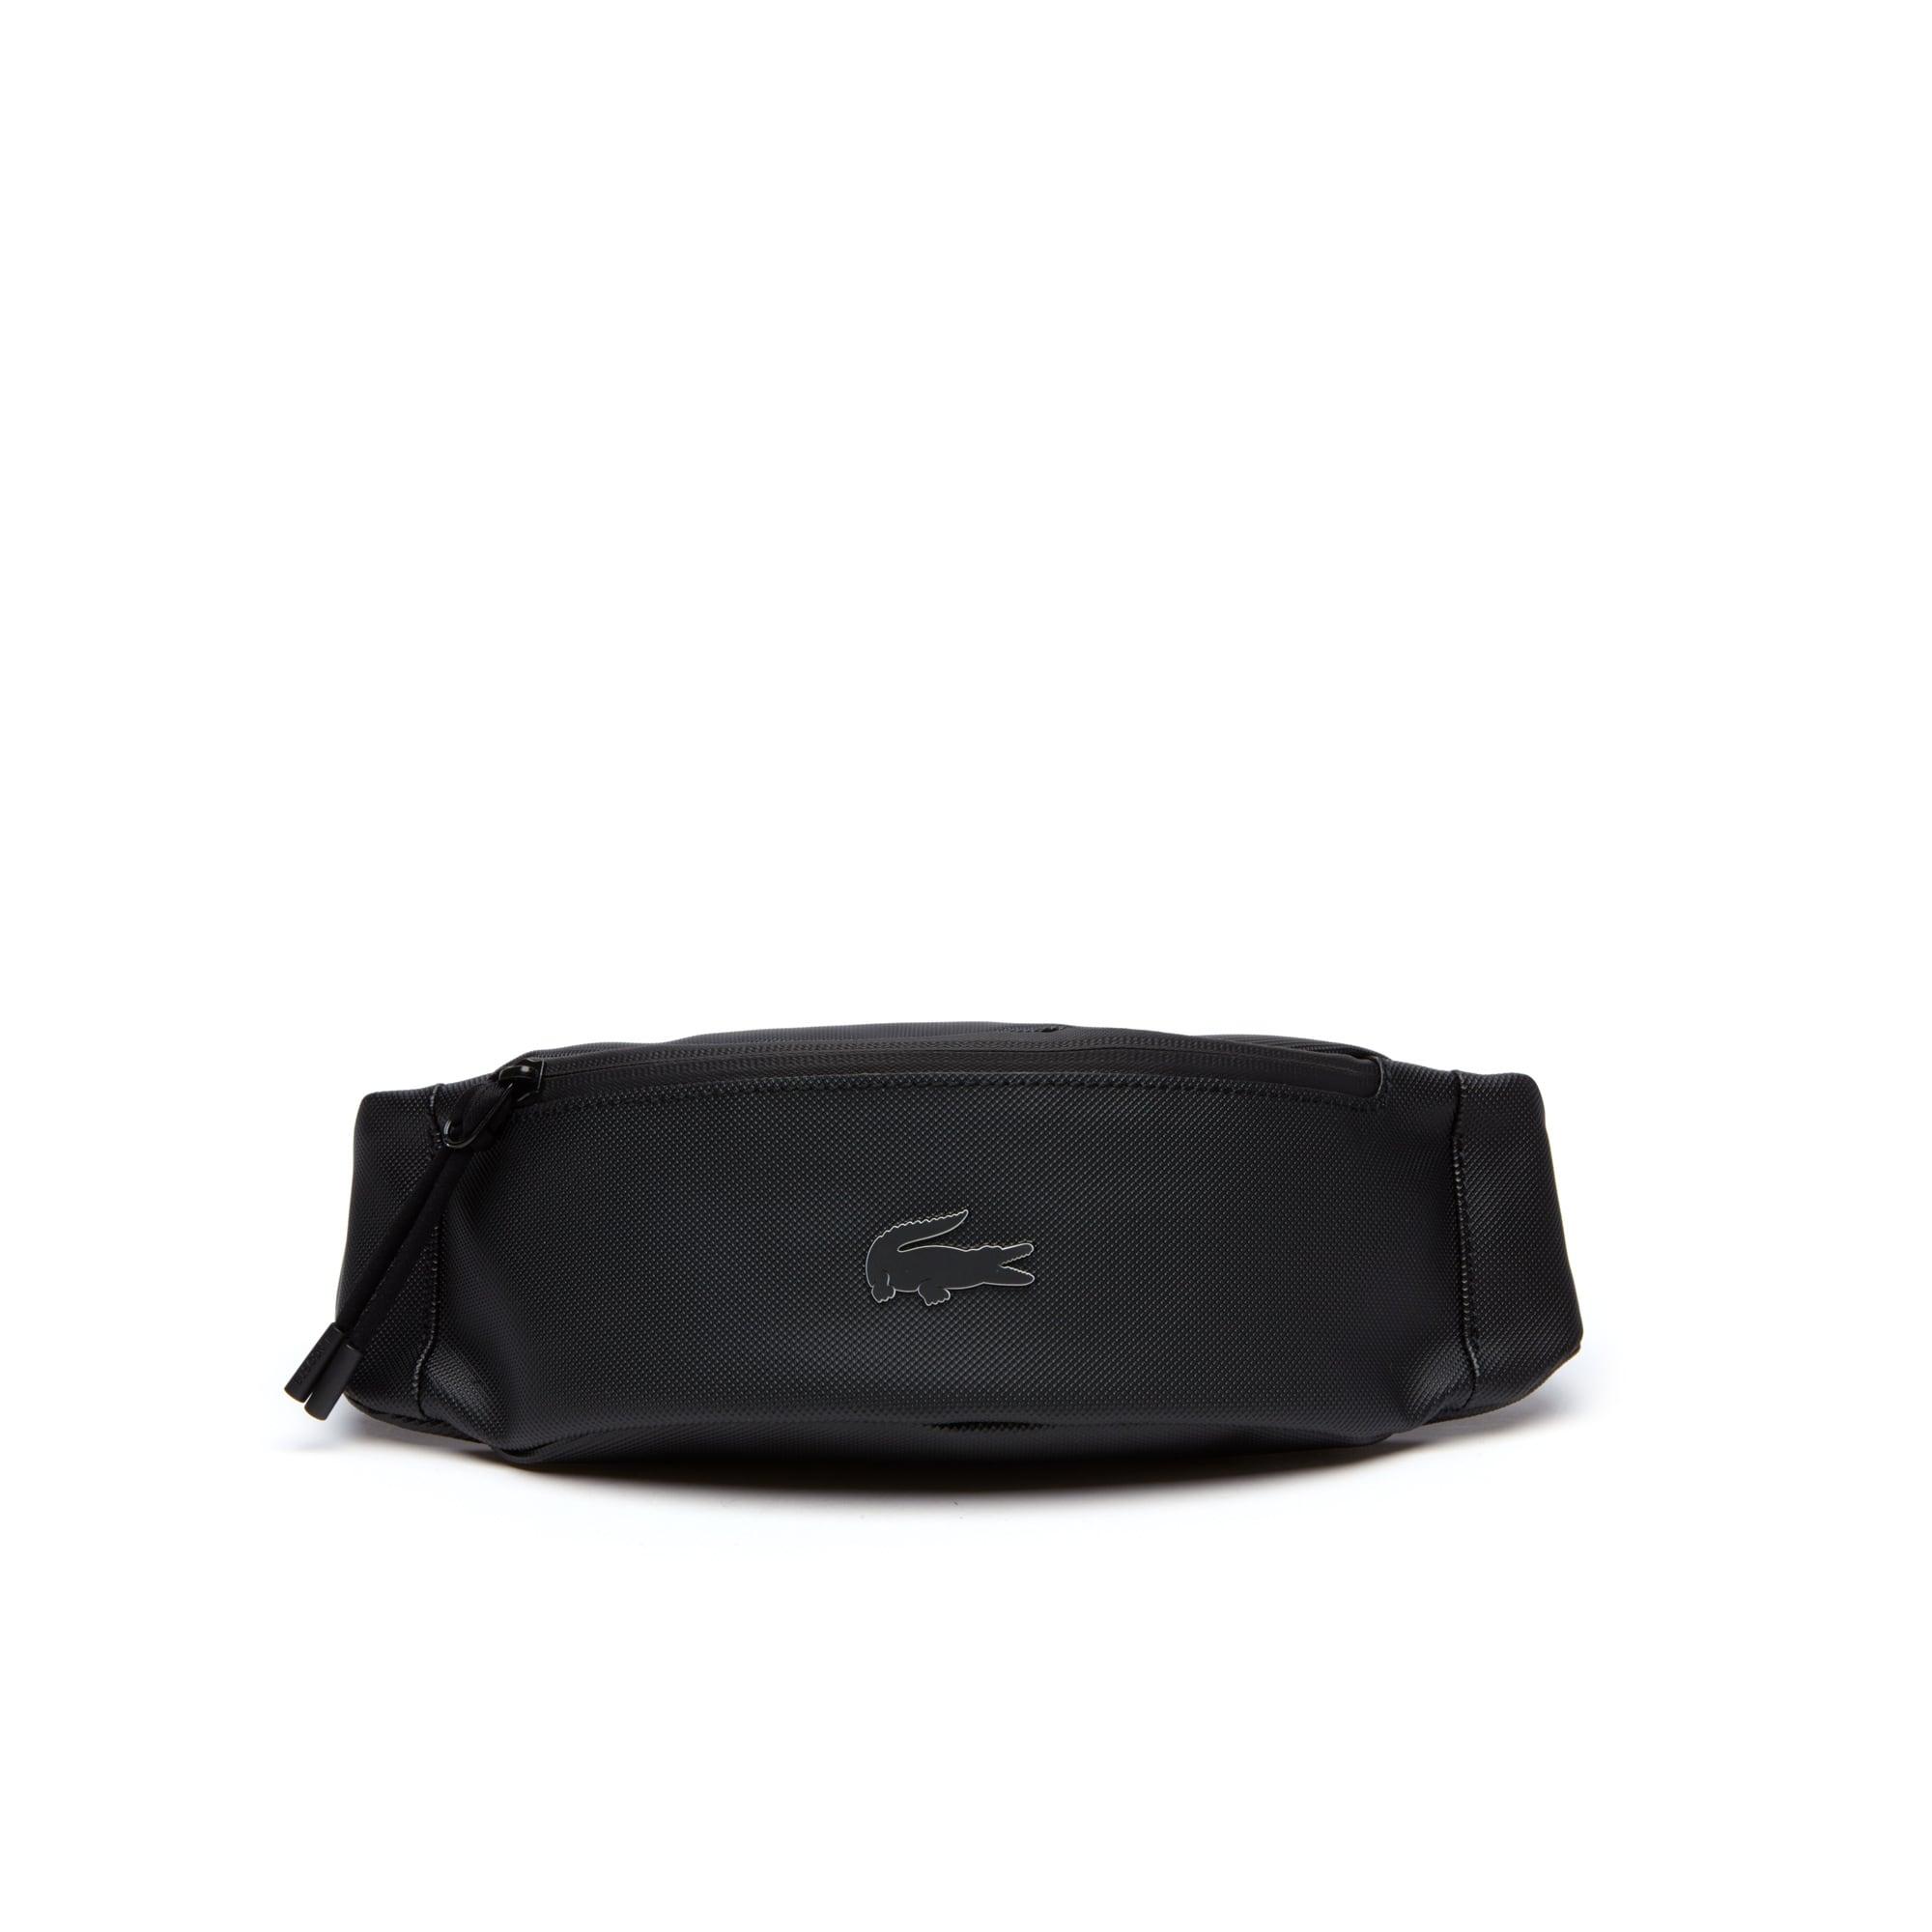 Bolsa de cintura com fecho L.12.12 Concept, monocromática em Petit Piqué